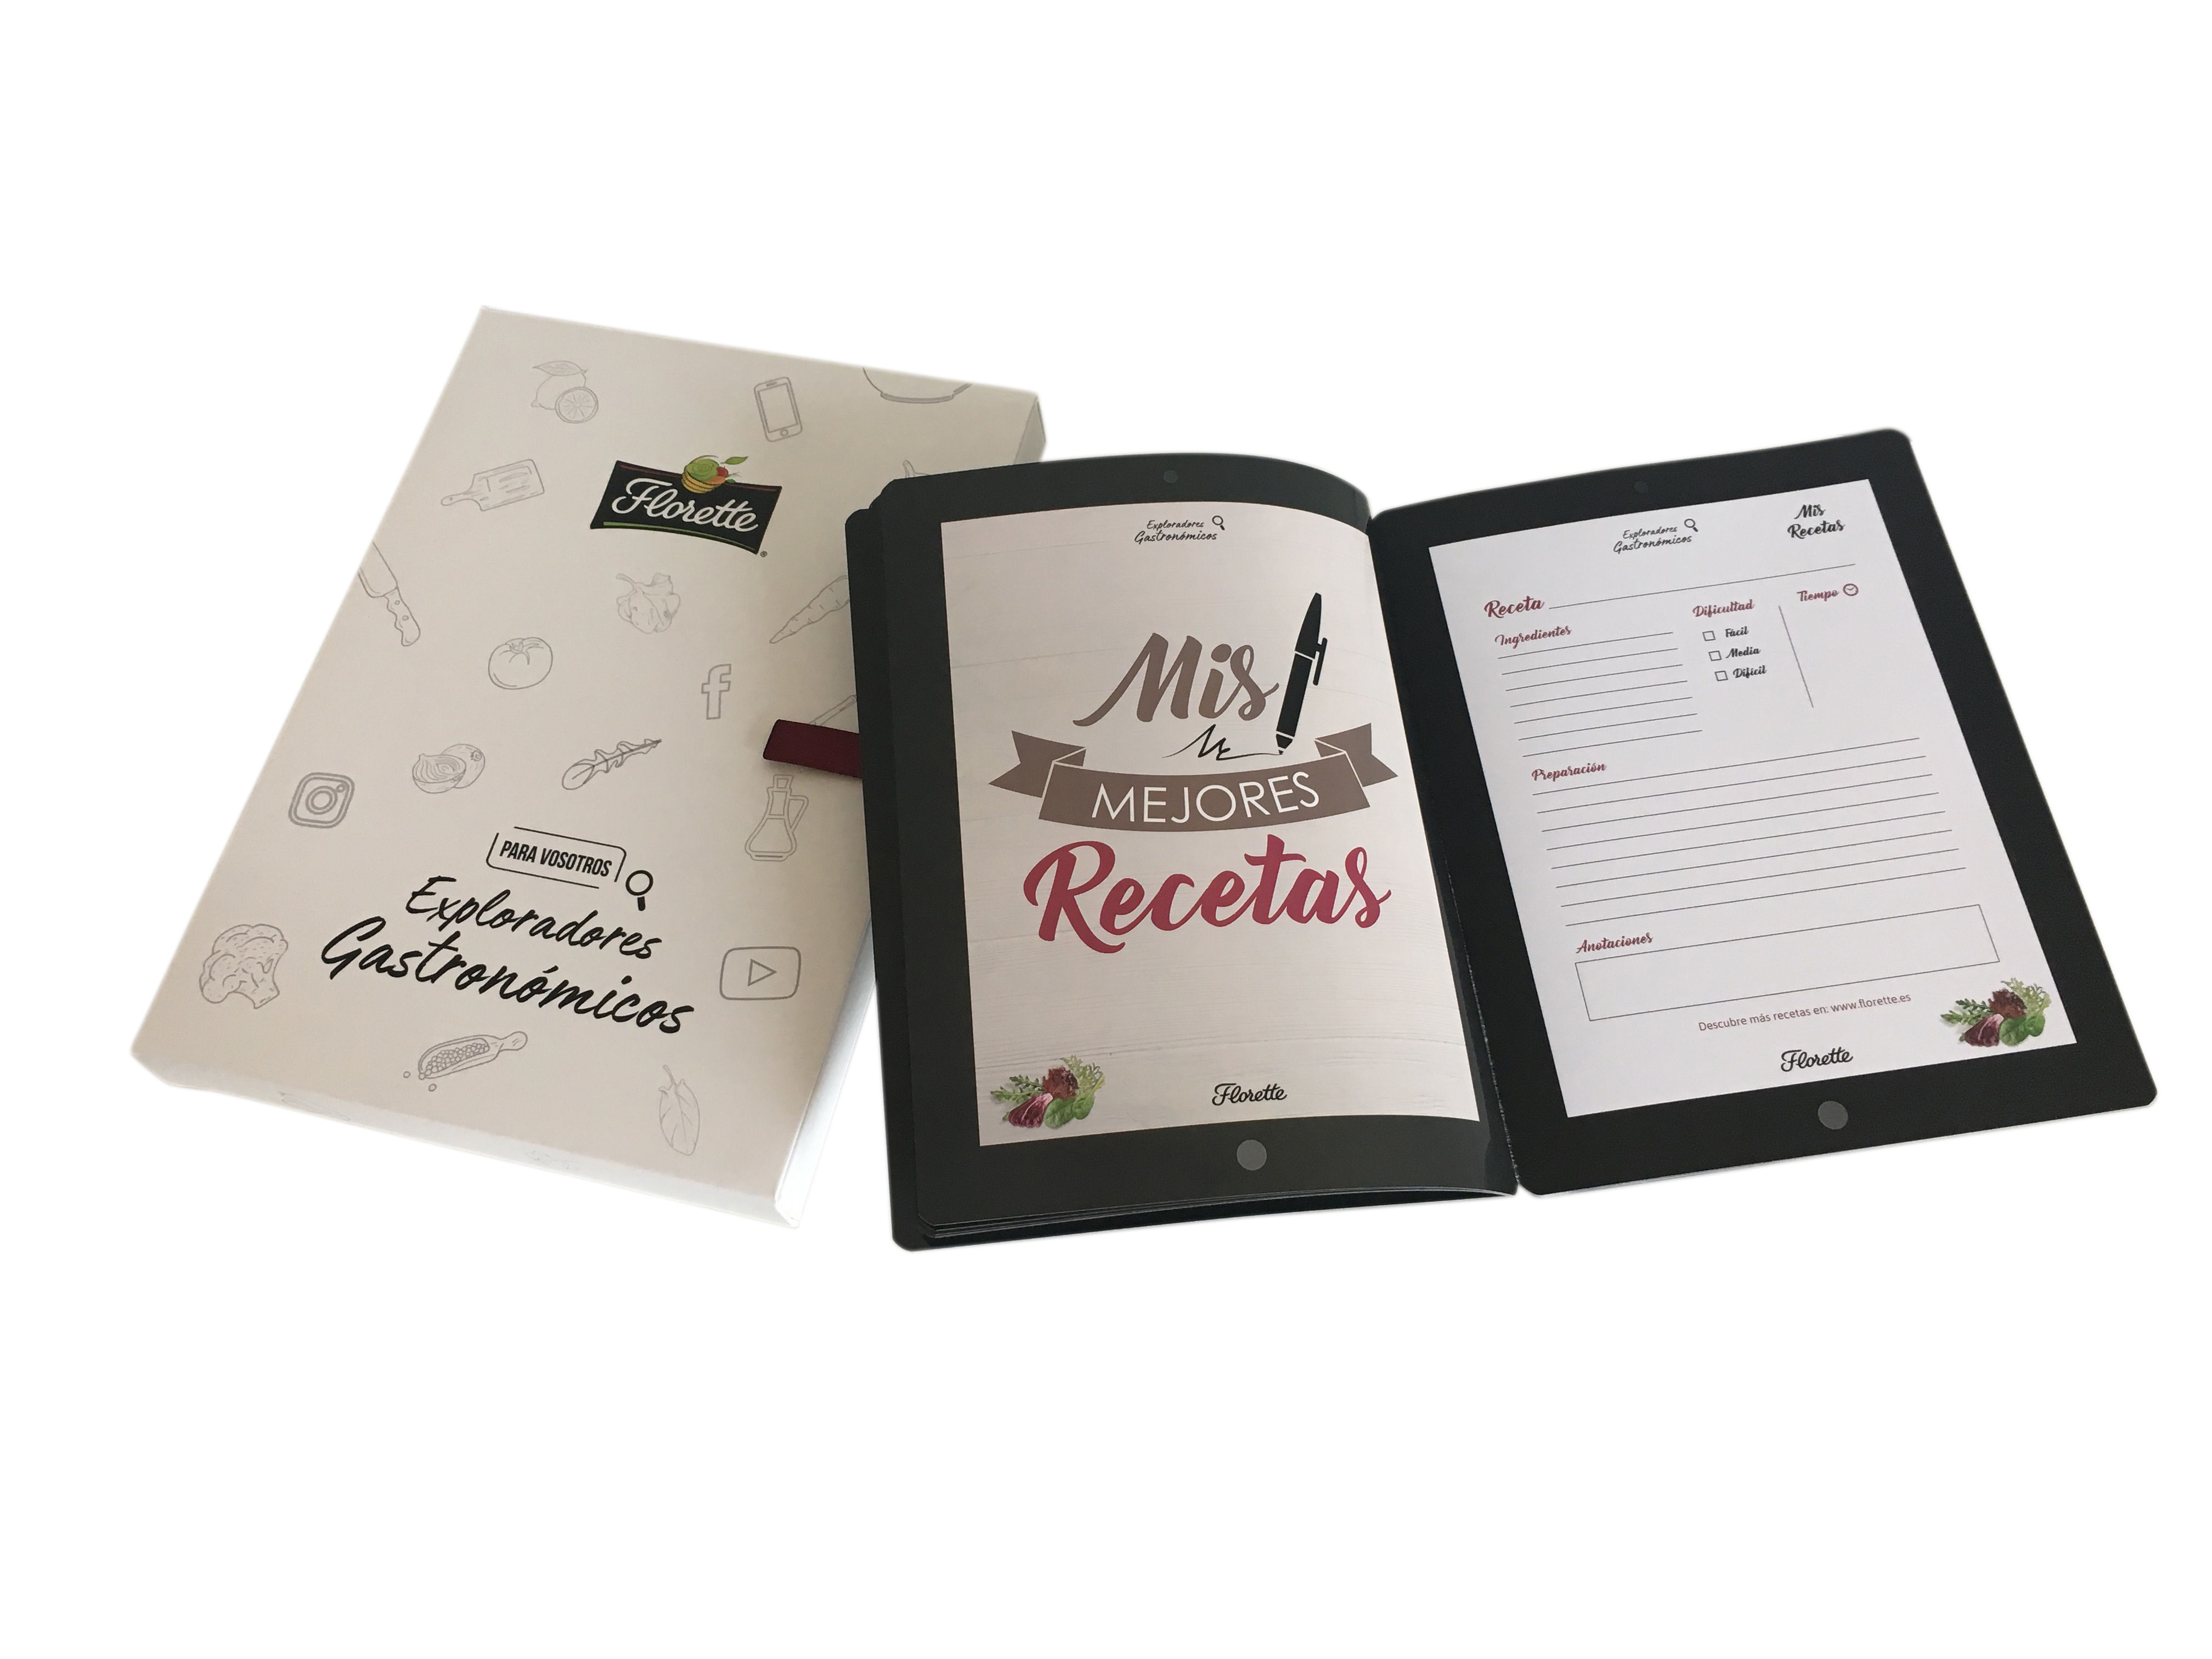 Florette. Trade Kit Exploradores gastronómicos